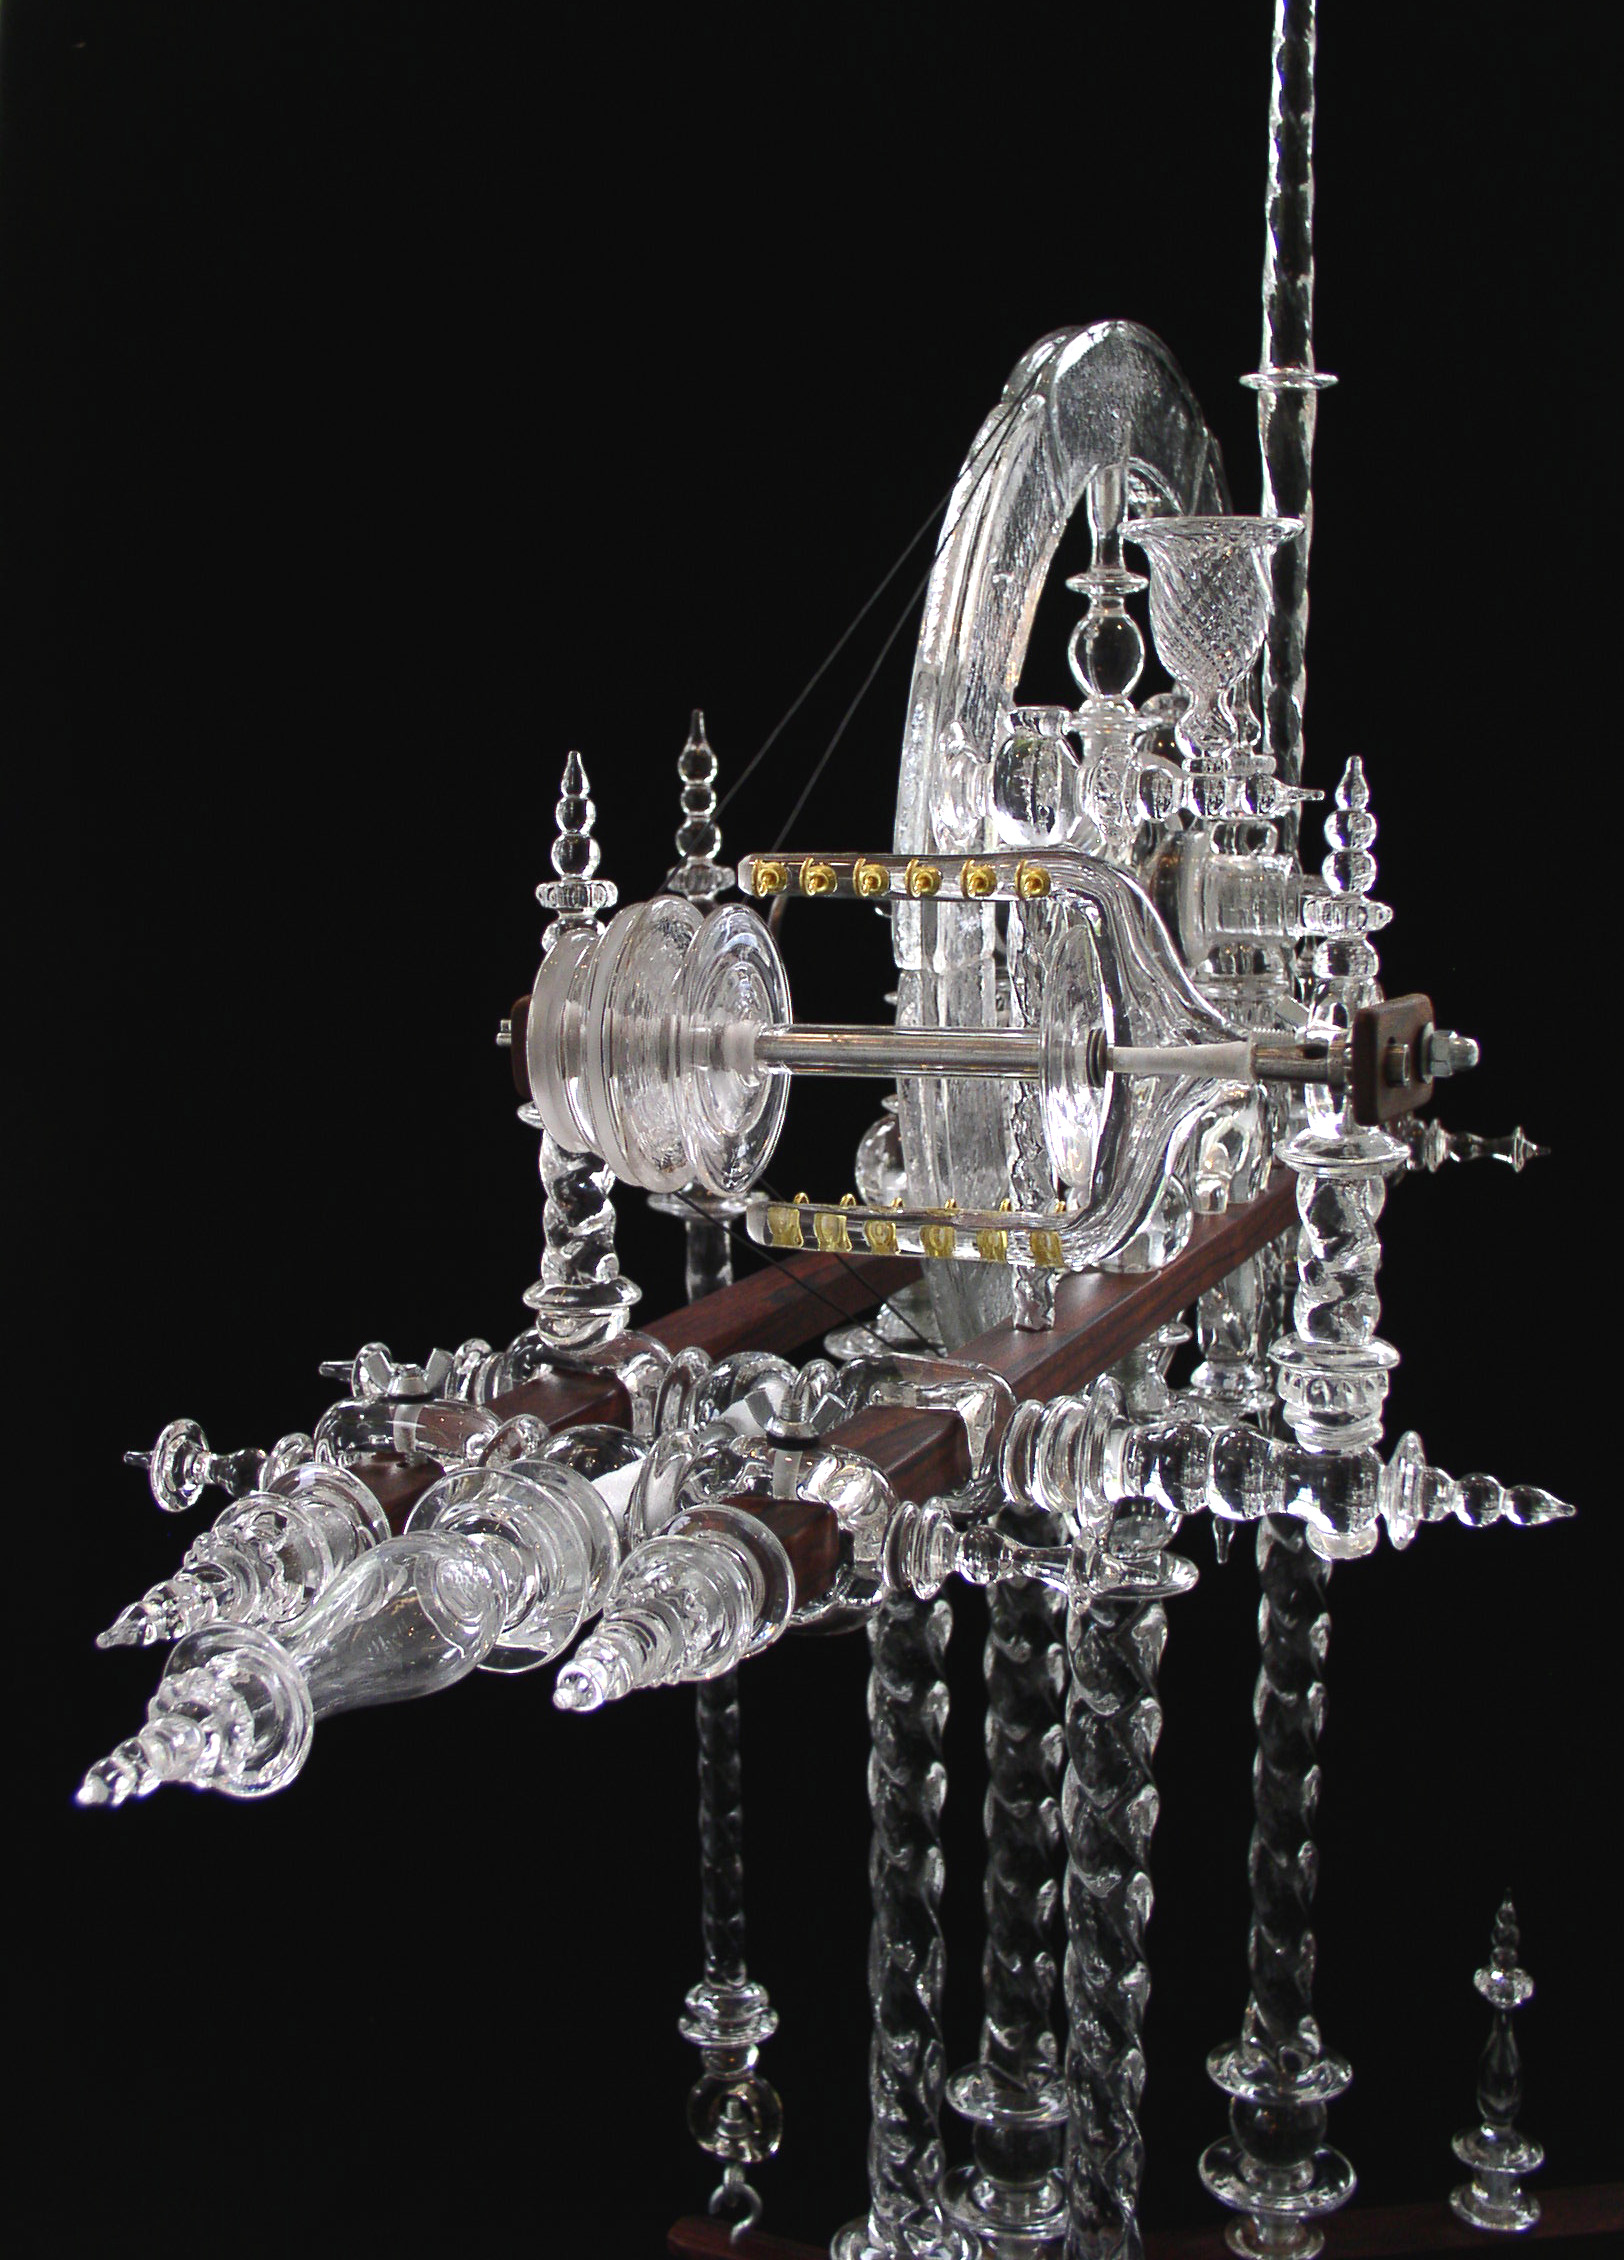 andy-paiko-spinning-wheel.jpg